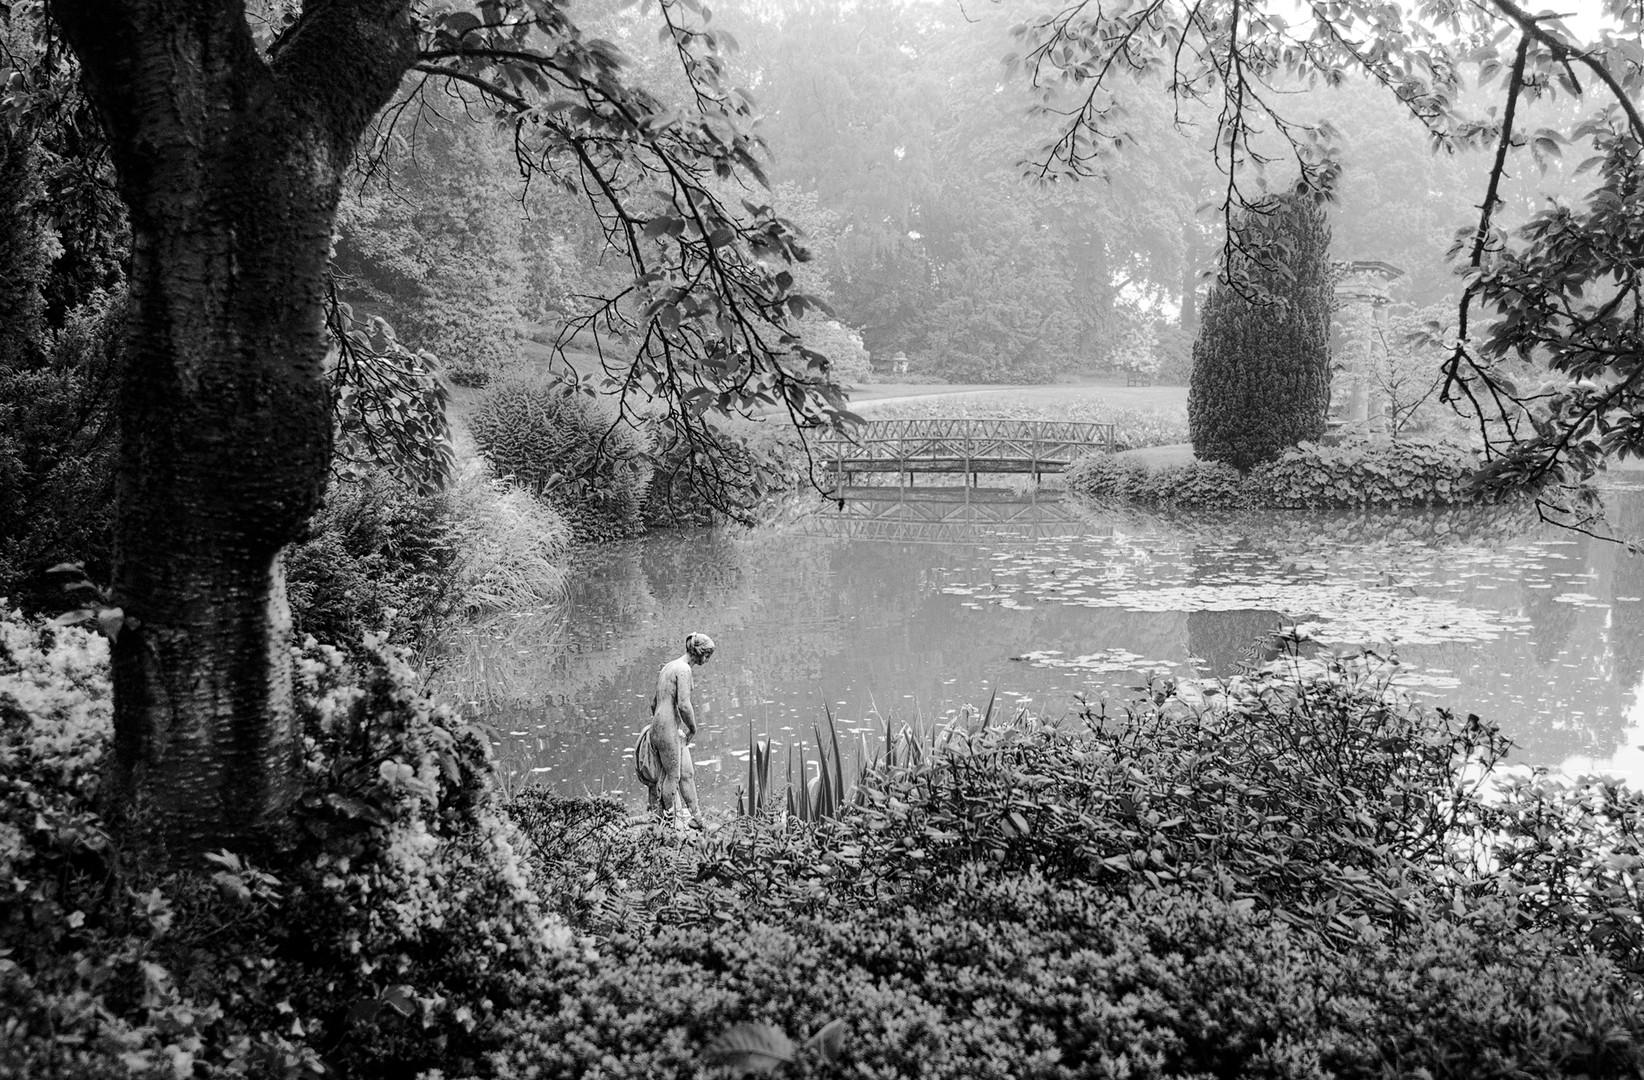 Temple Garden, Cholmondeley